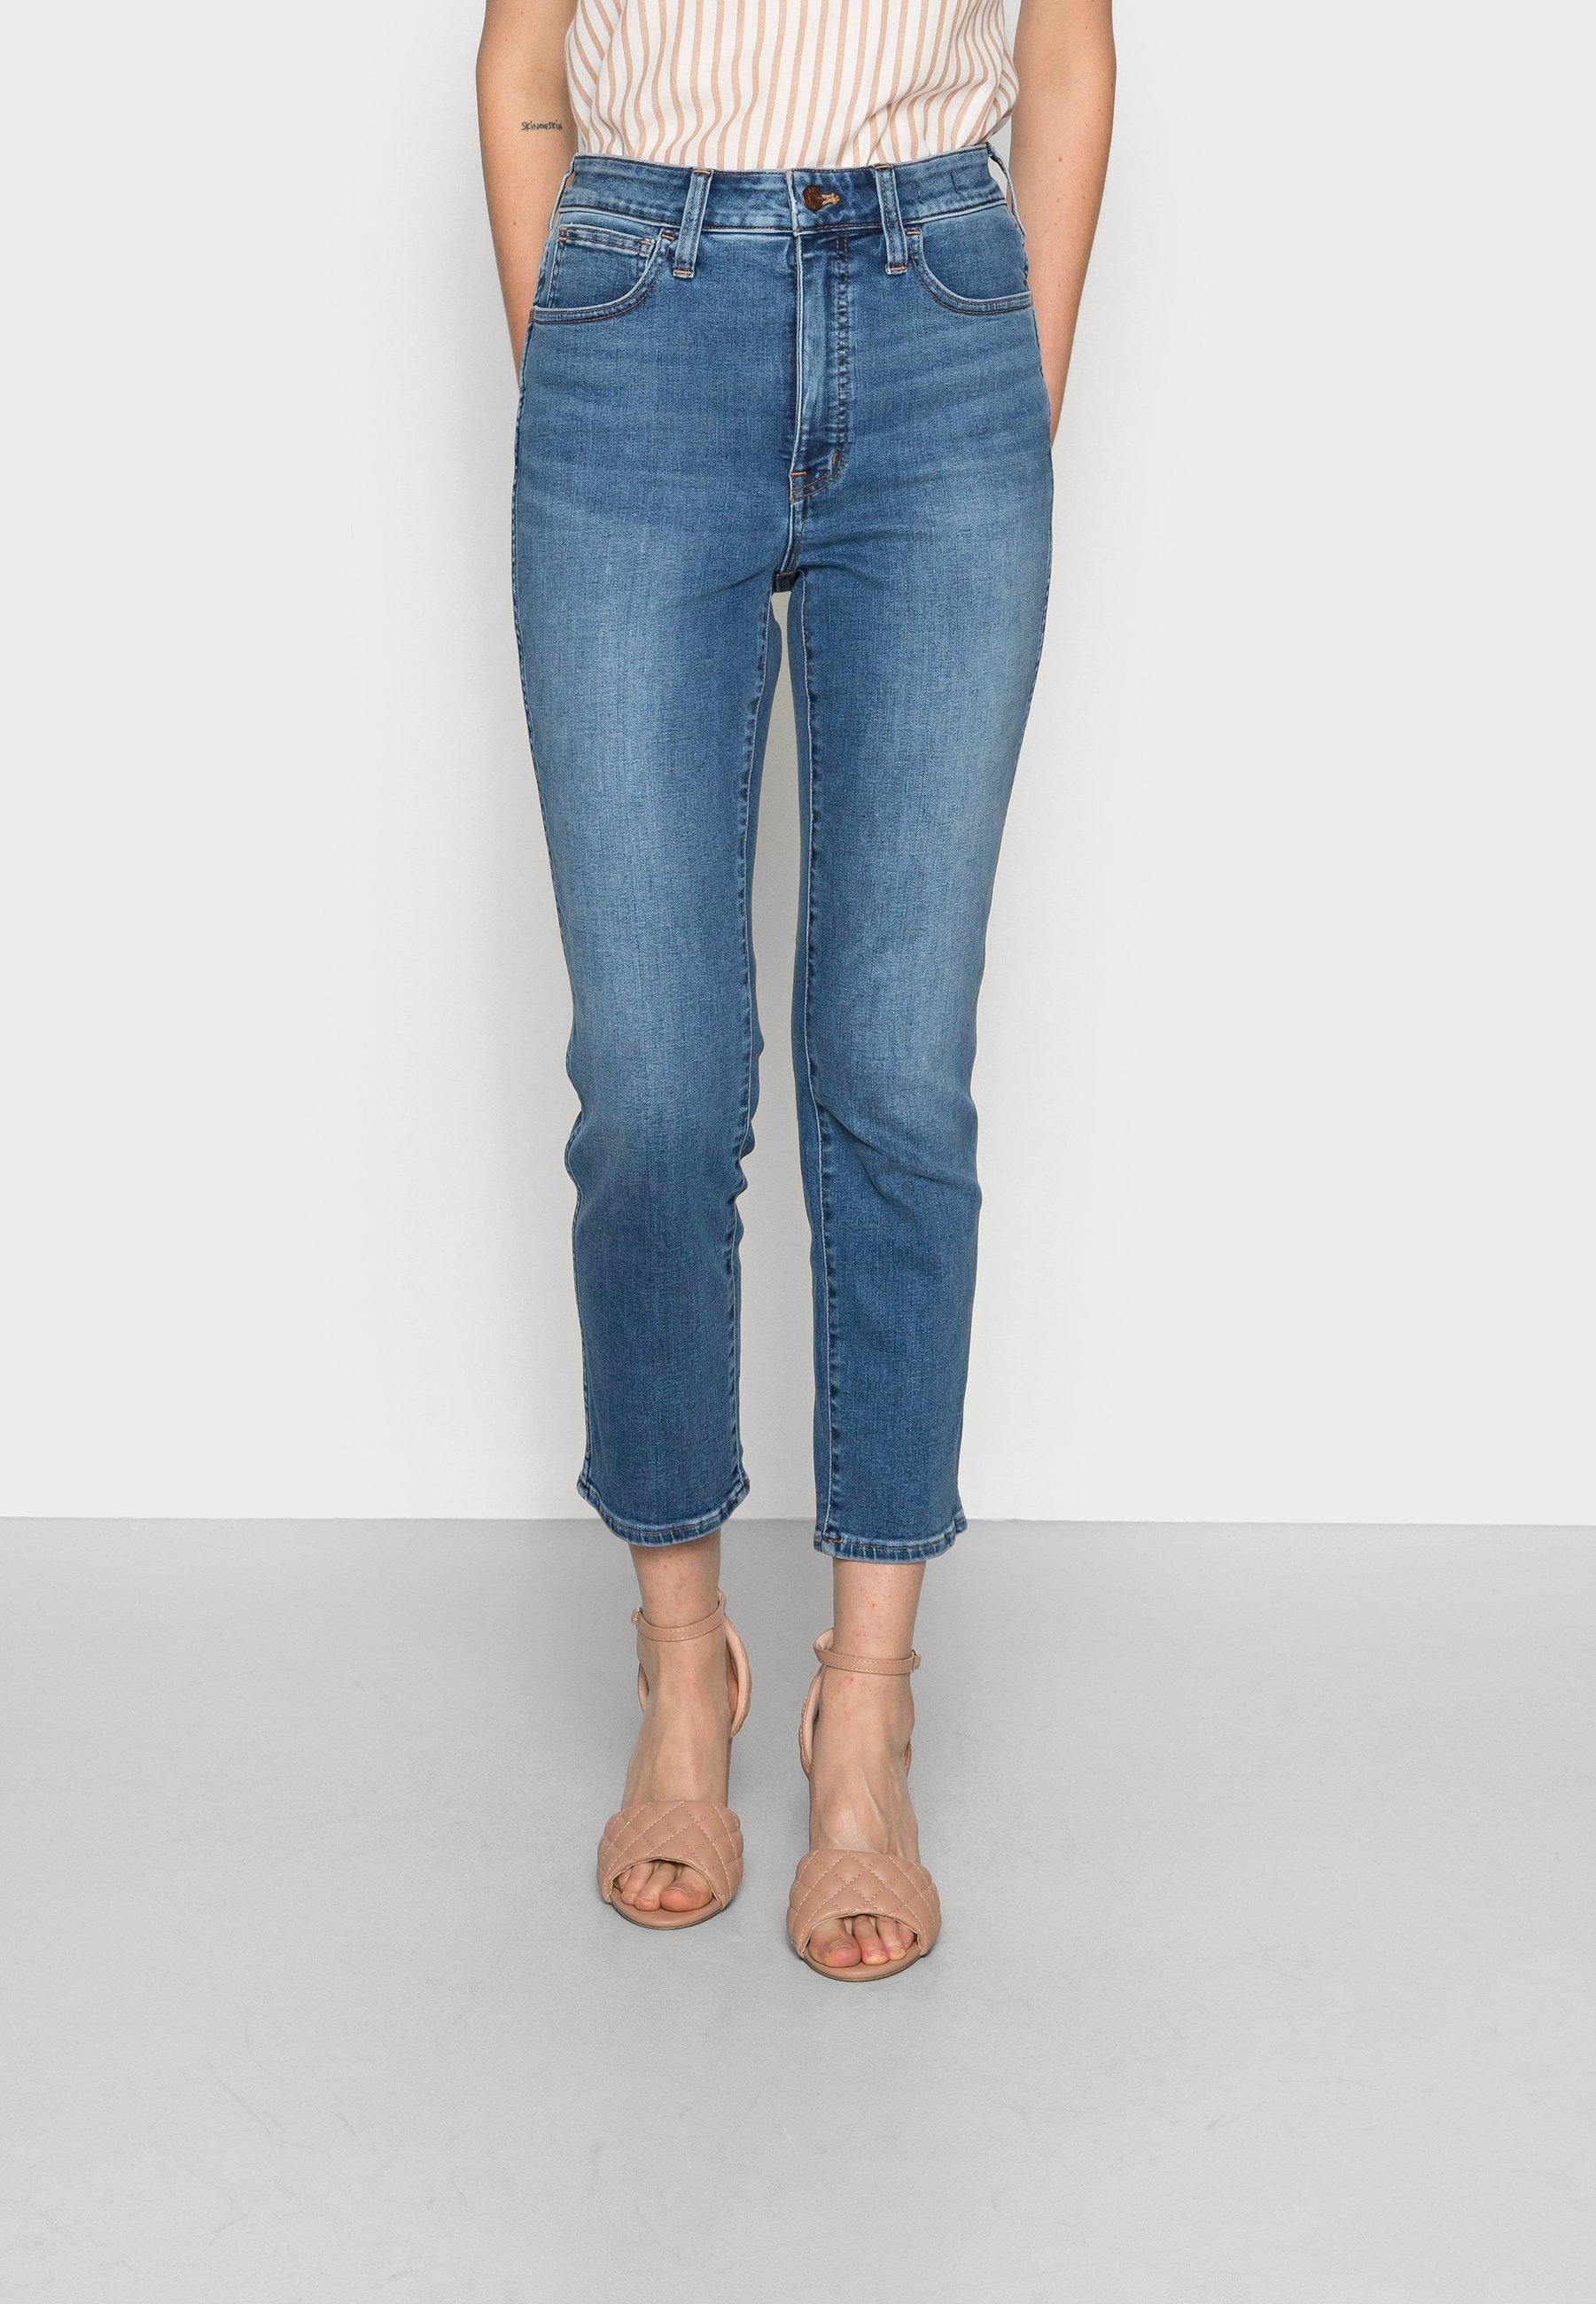 Donna CURVY ROADTRIPPER STOVEPIPE - Jeans slim fit